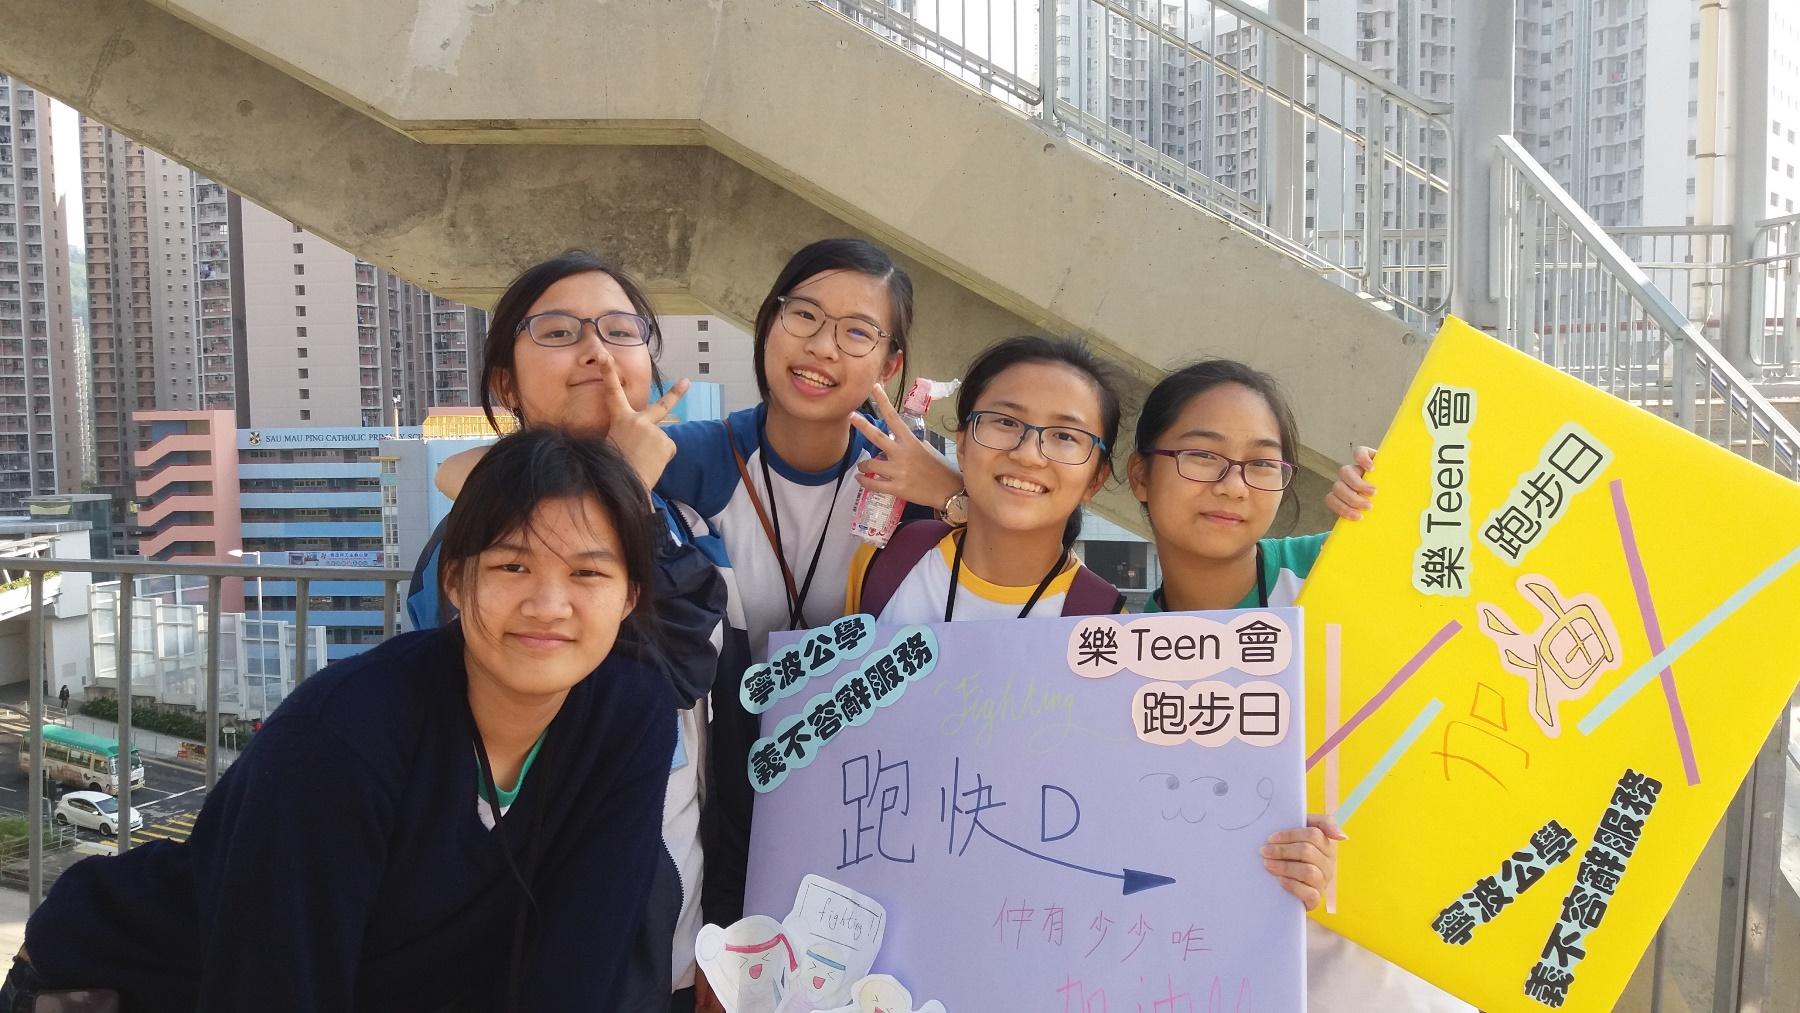 http://npc.edu.hk/sites/default/files/20181111_152148.jpg